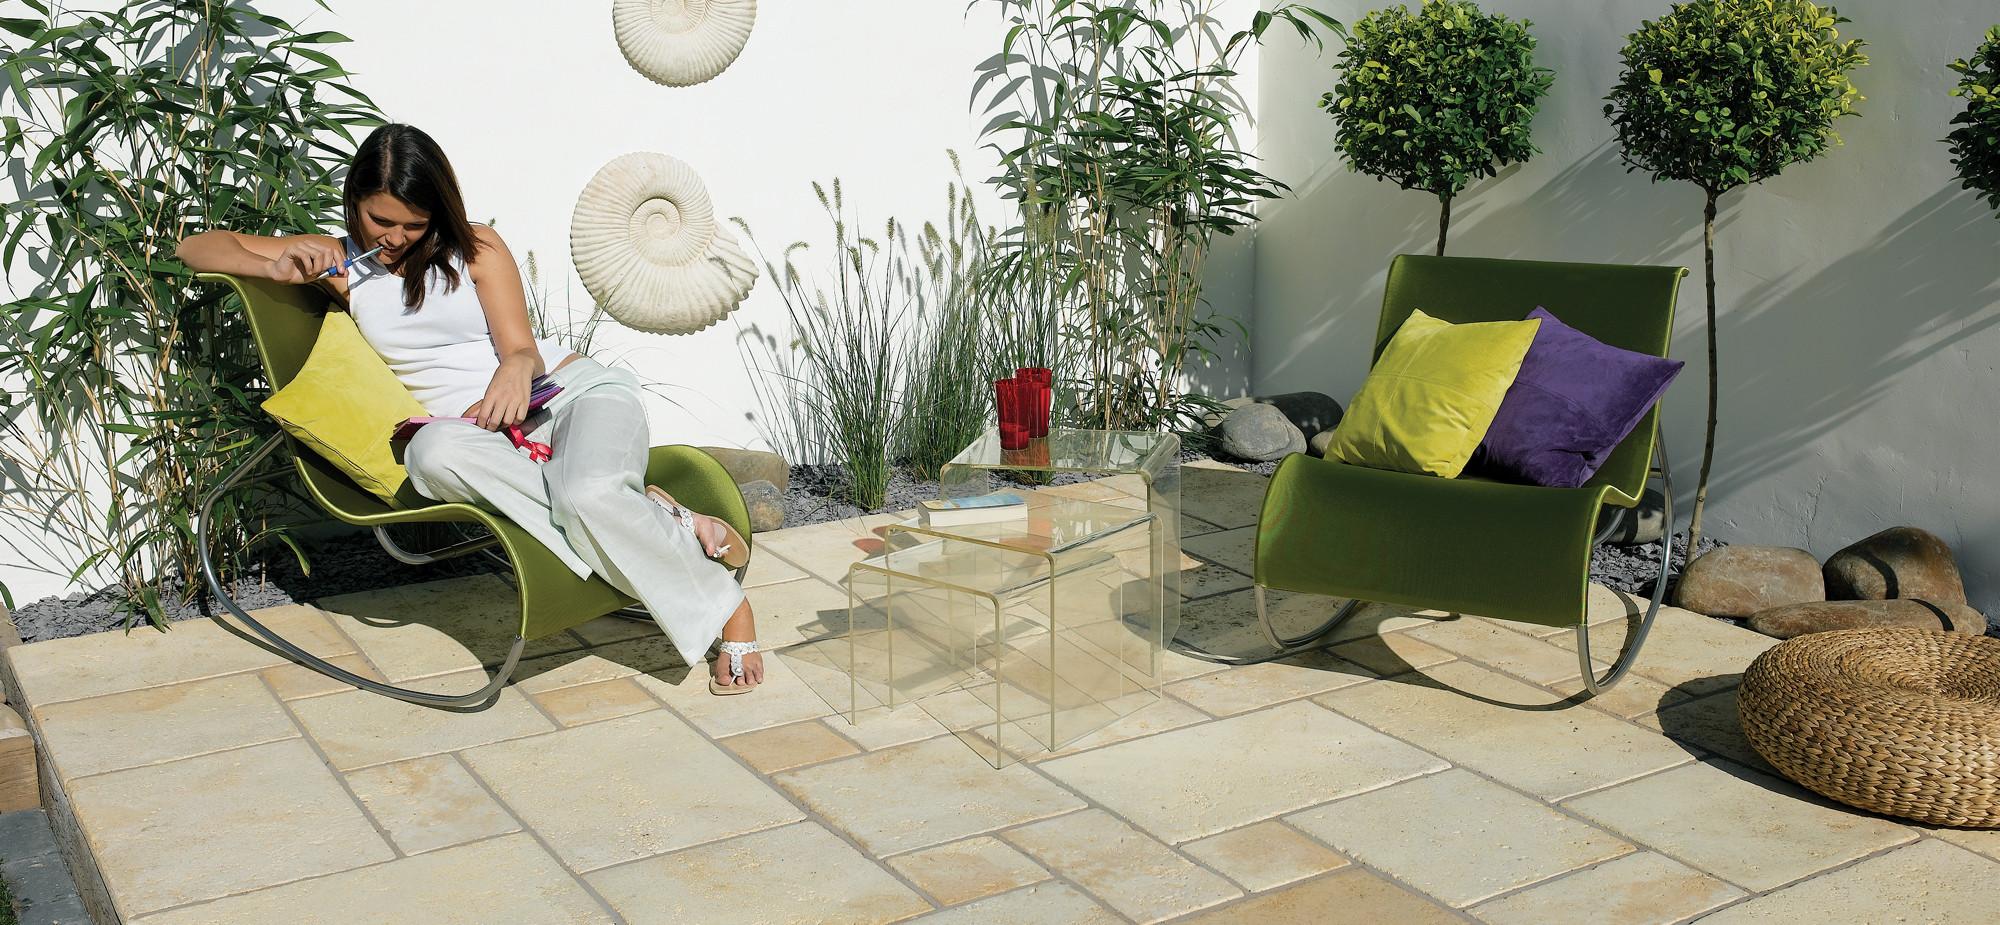 Pavimento exterior suelo imitacin madera para terrazas - Pavimento para exterior ...